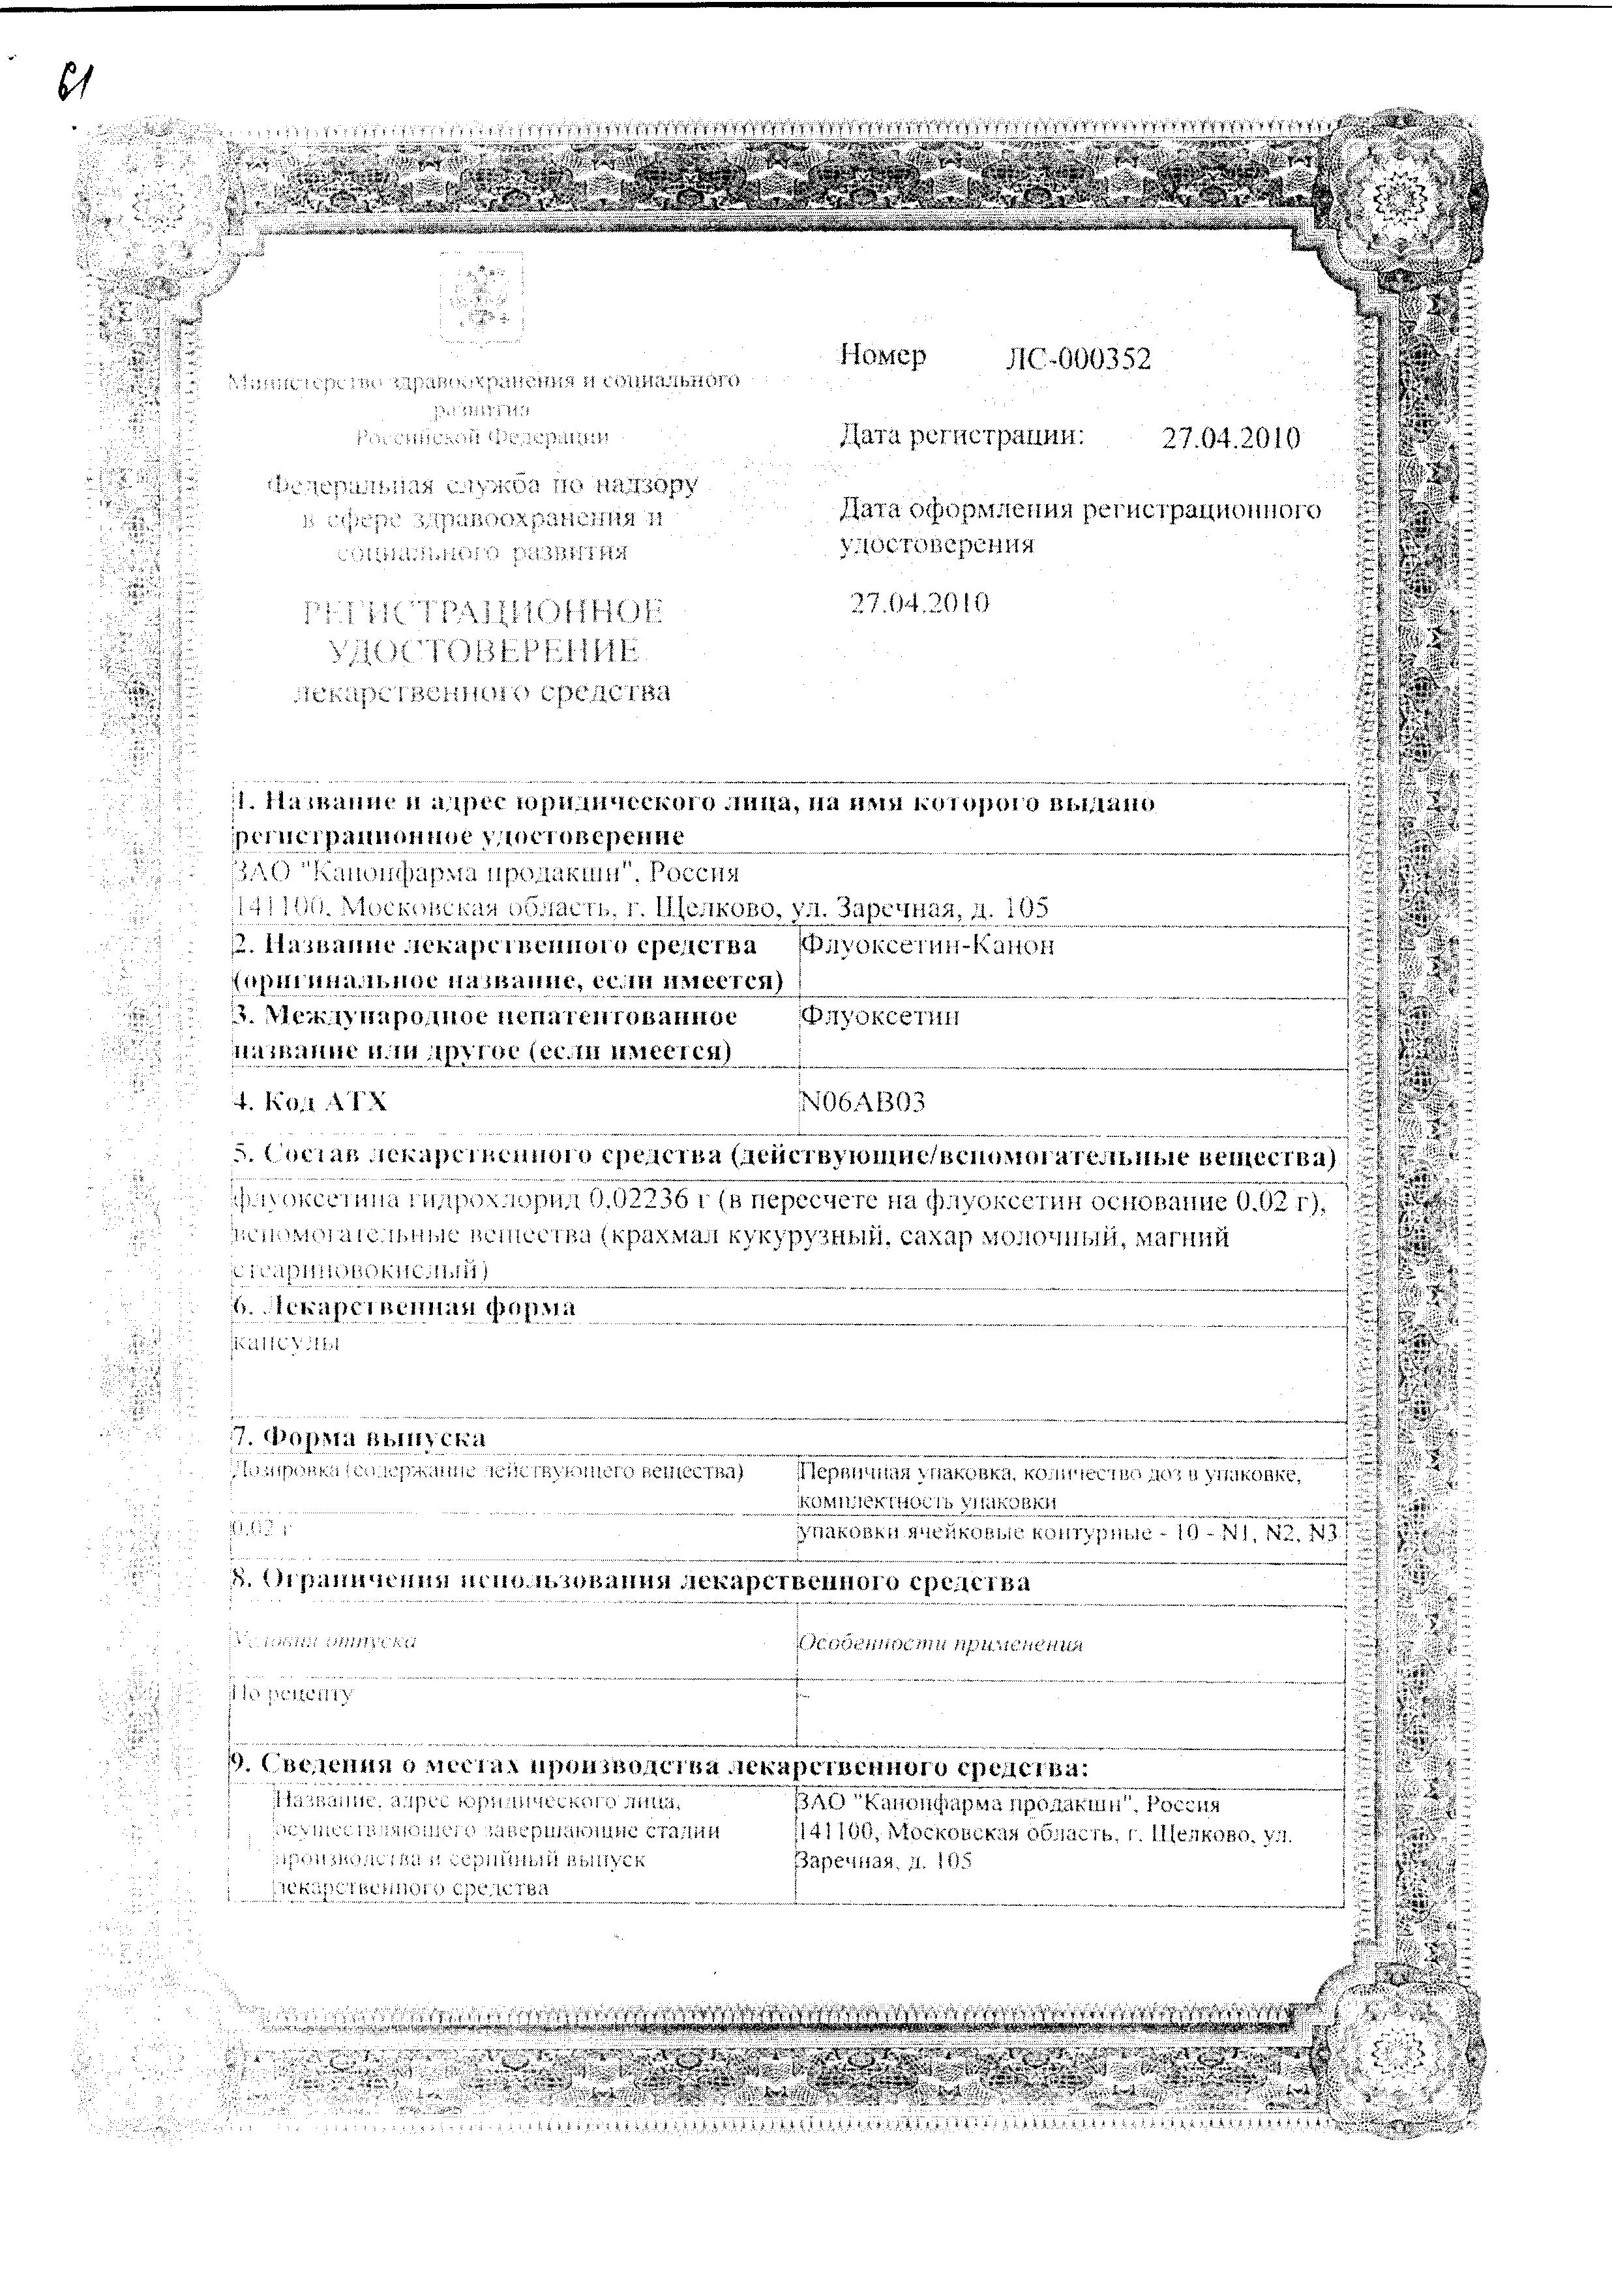 Флуоксетин-Канон сертификат